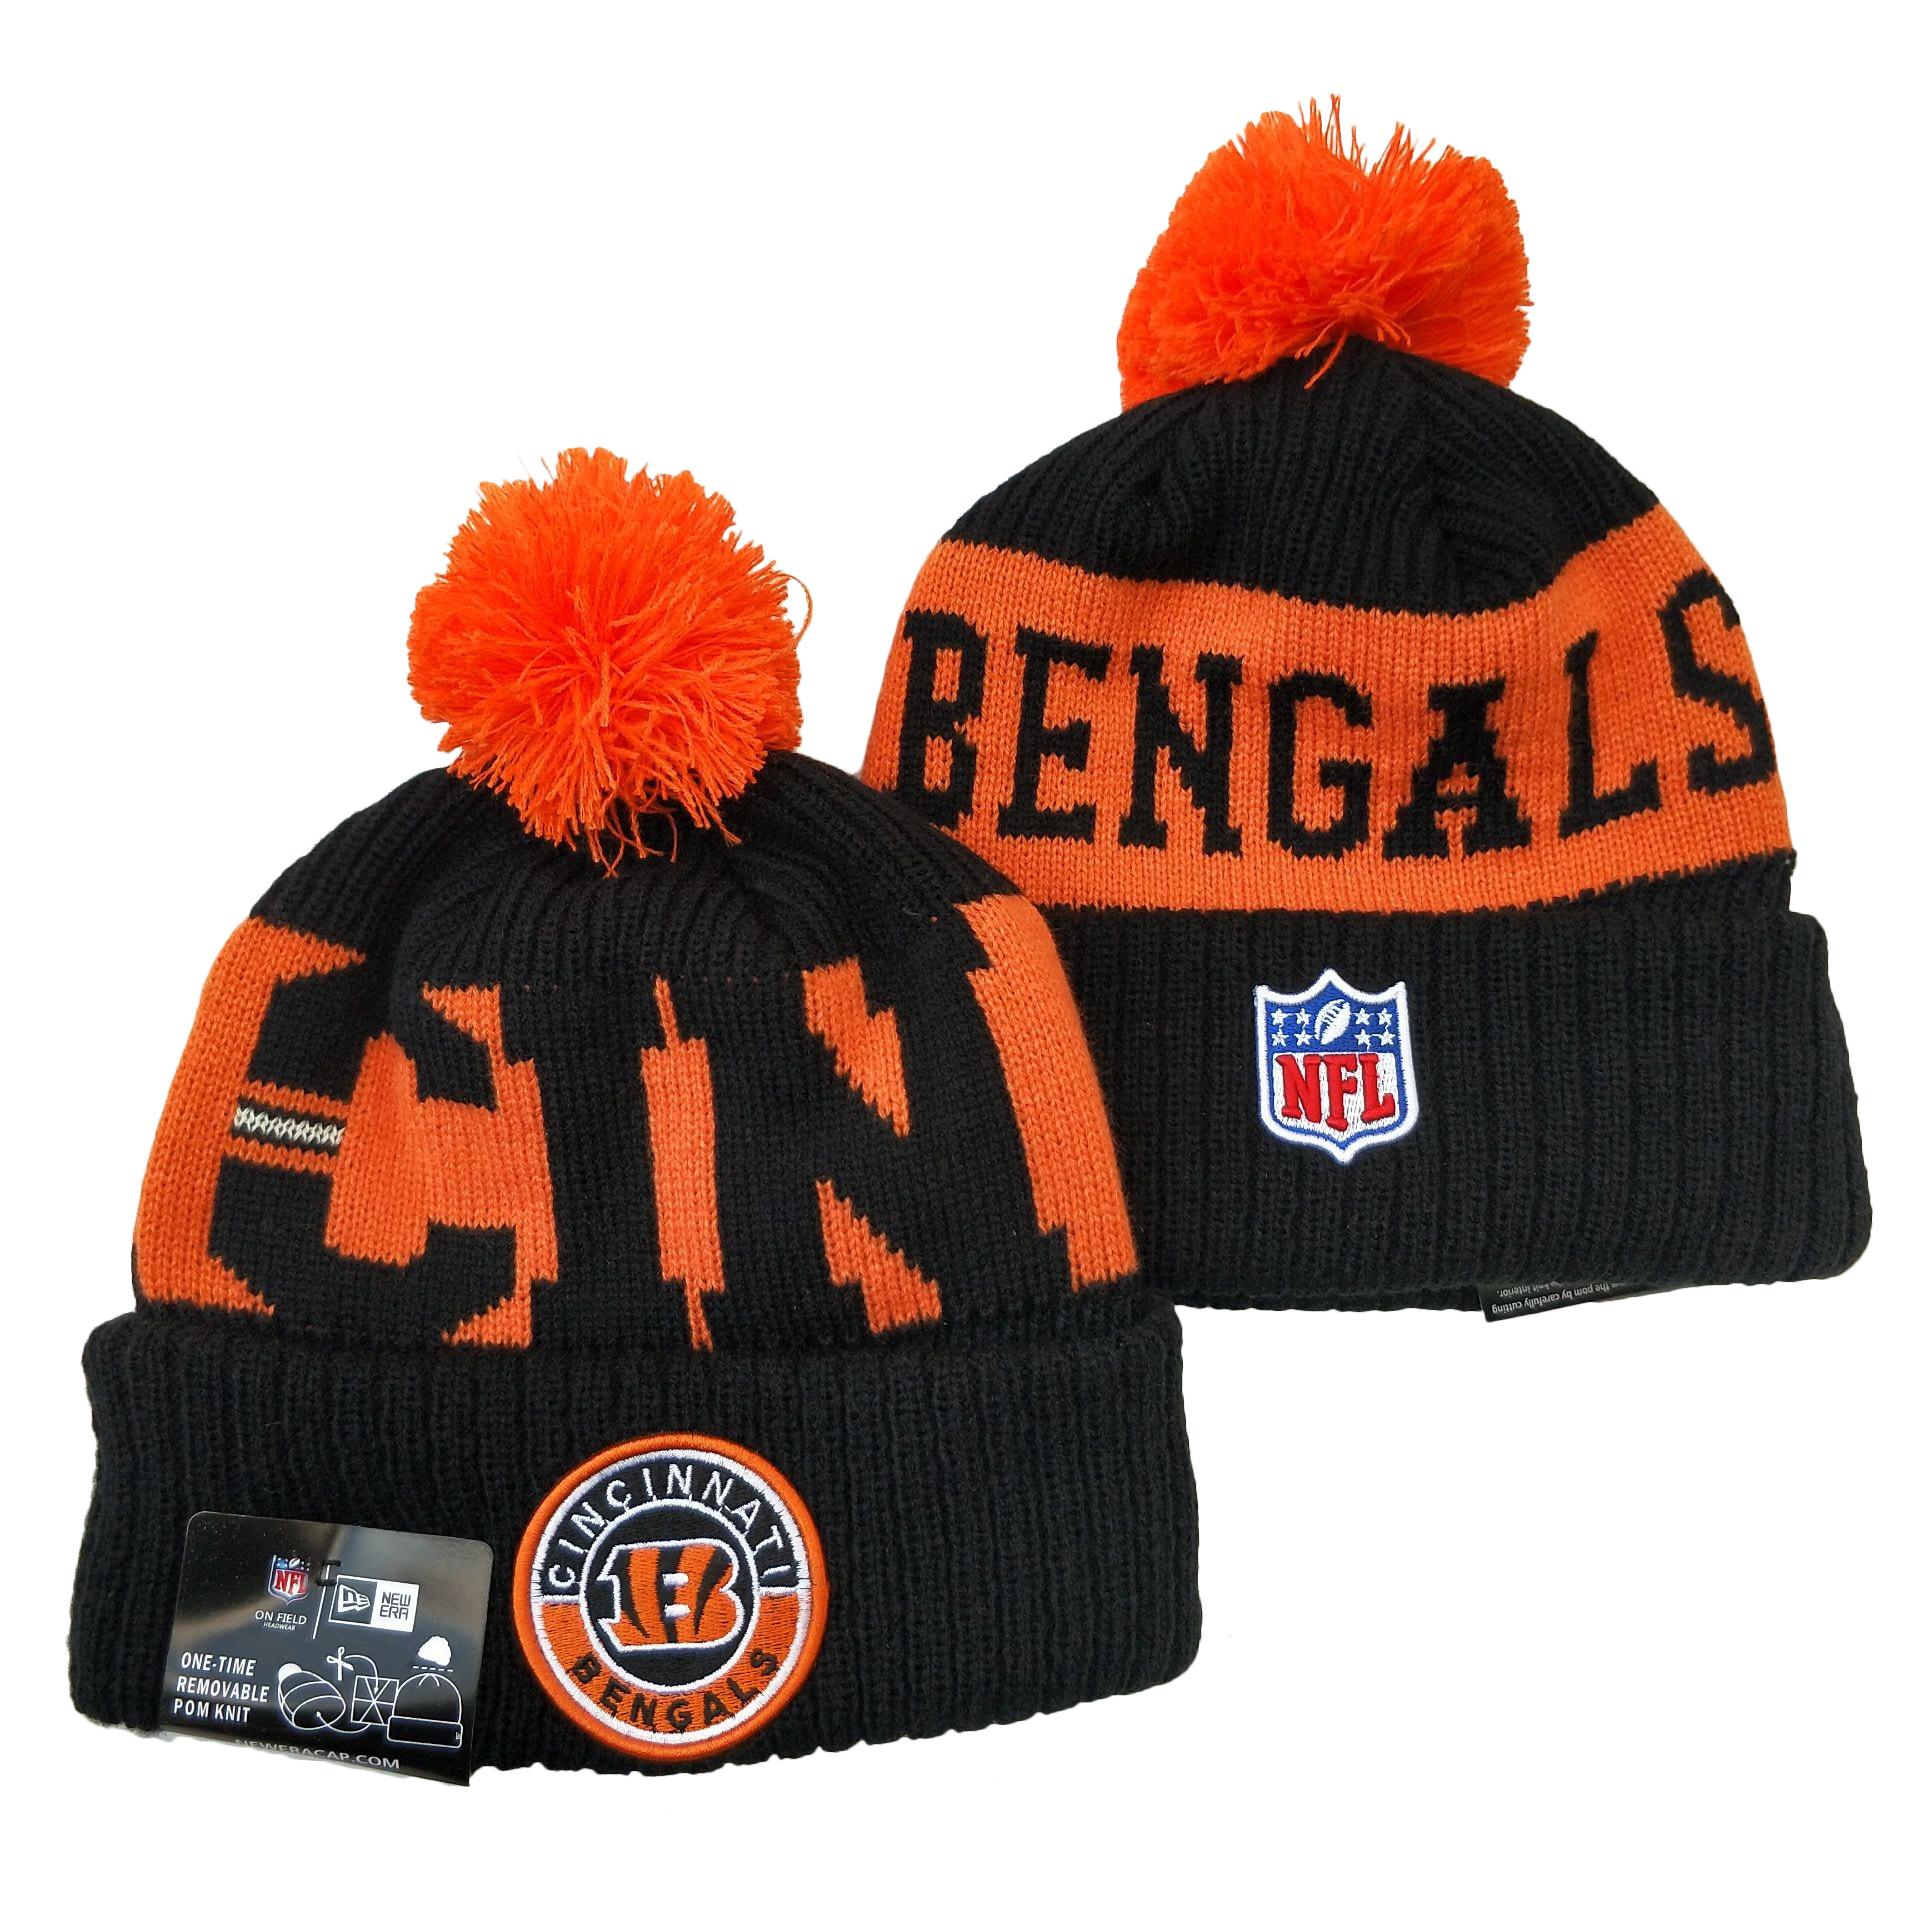 Bengals Team Logo Black Orange 2020 NFL Sideline Pom Cuffed Knit Hat YD